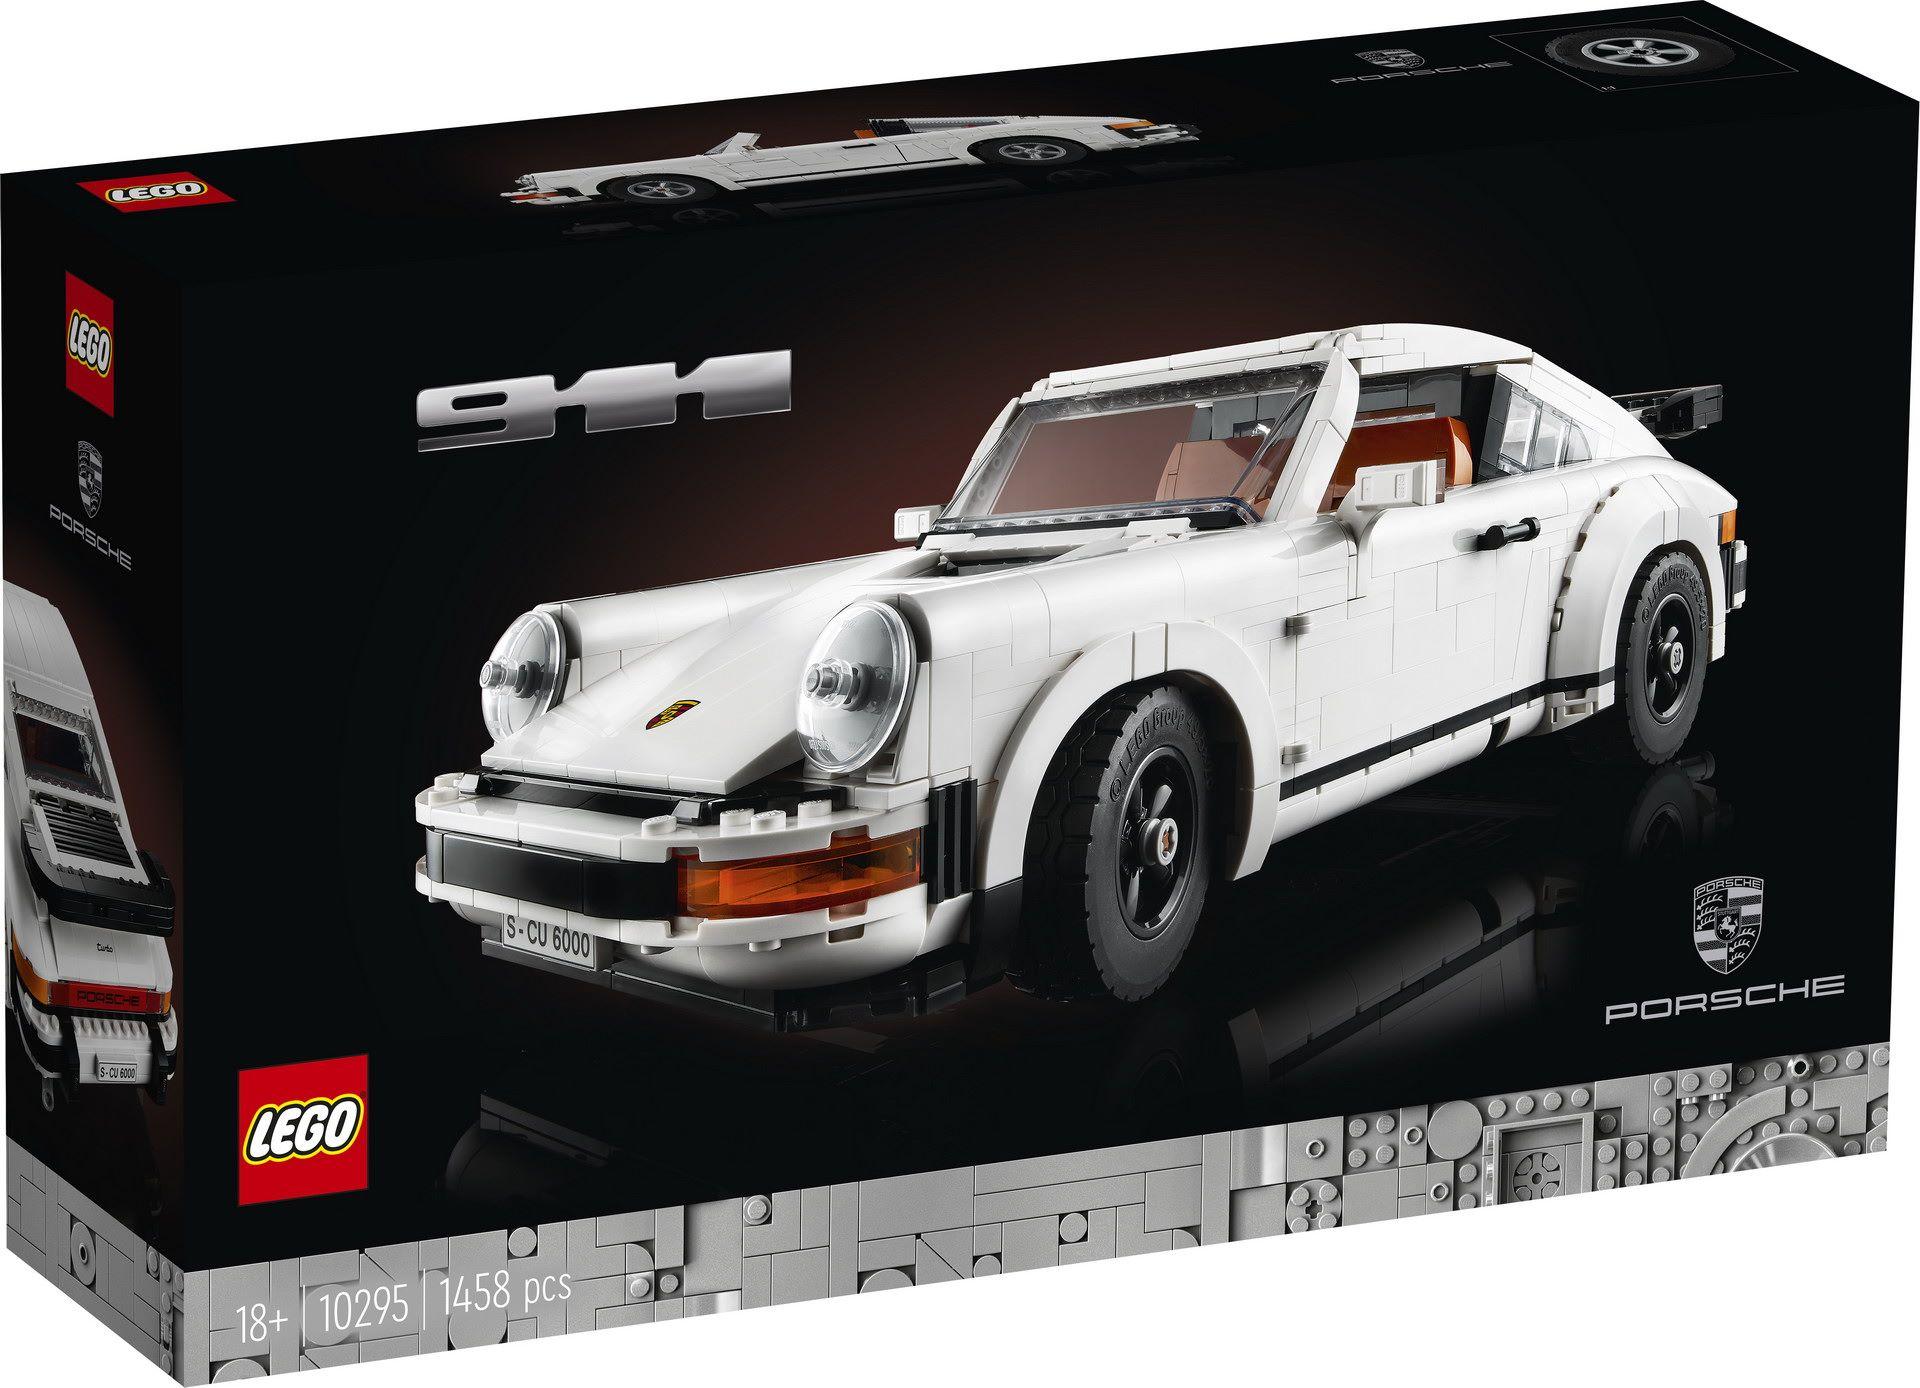 Porsche-911-Turbo-and-Targa-kit-4